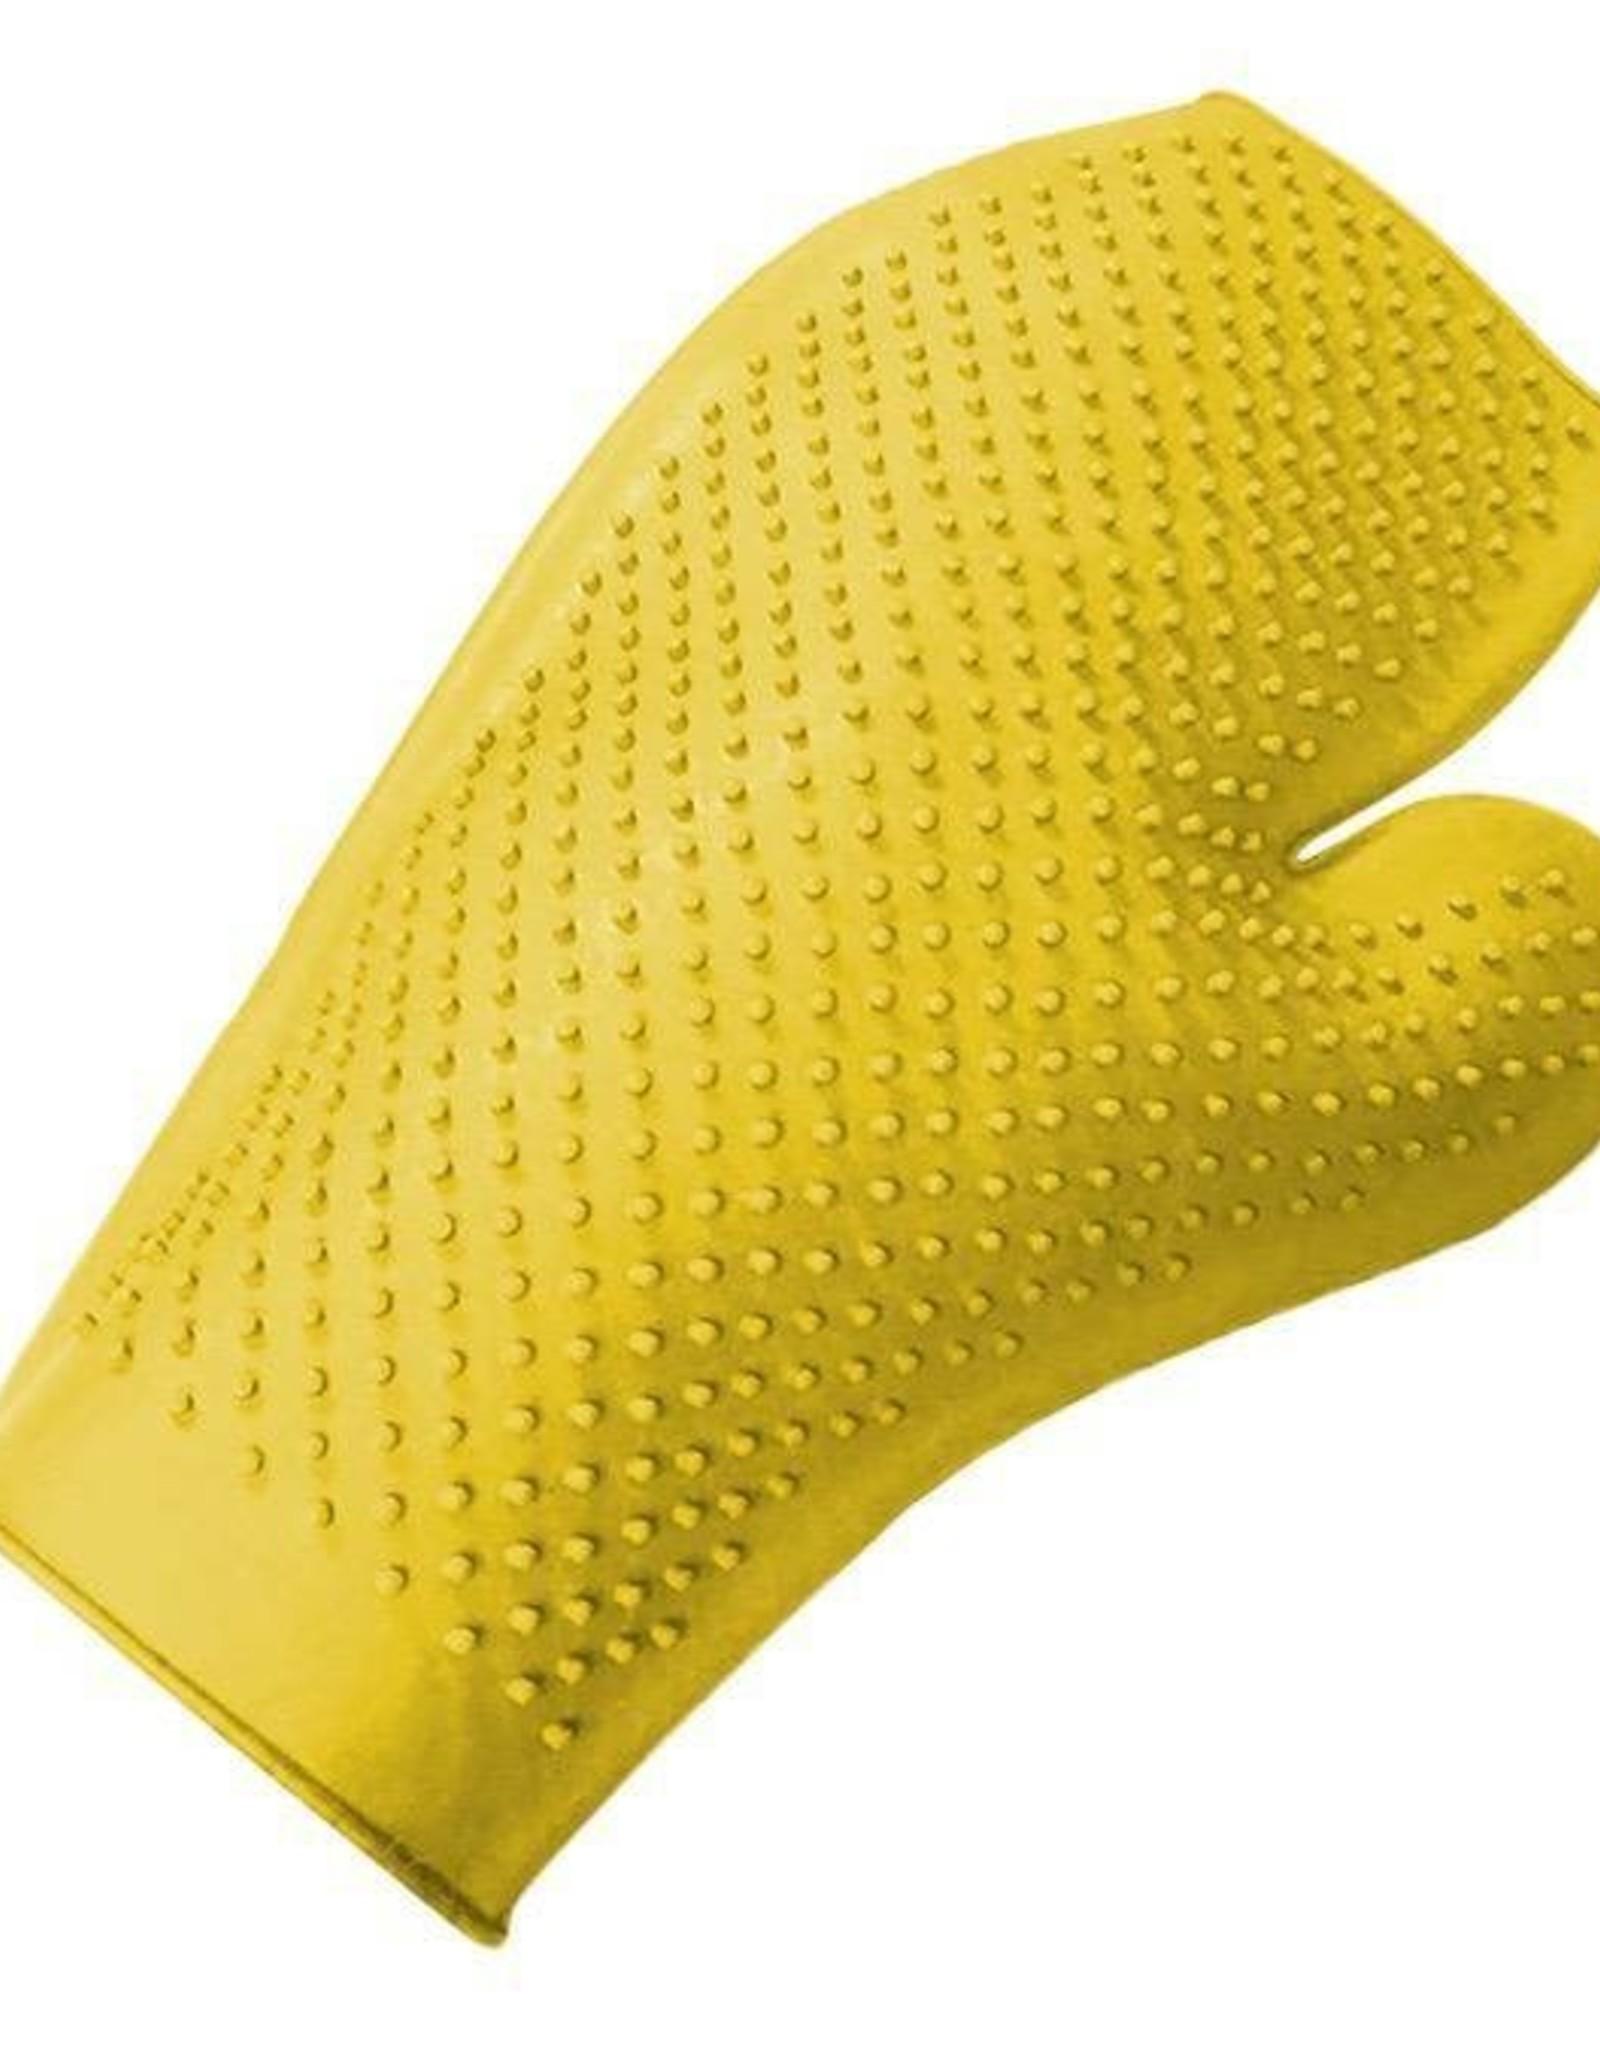 Rubber Massage Glove - Assorted